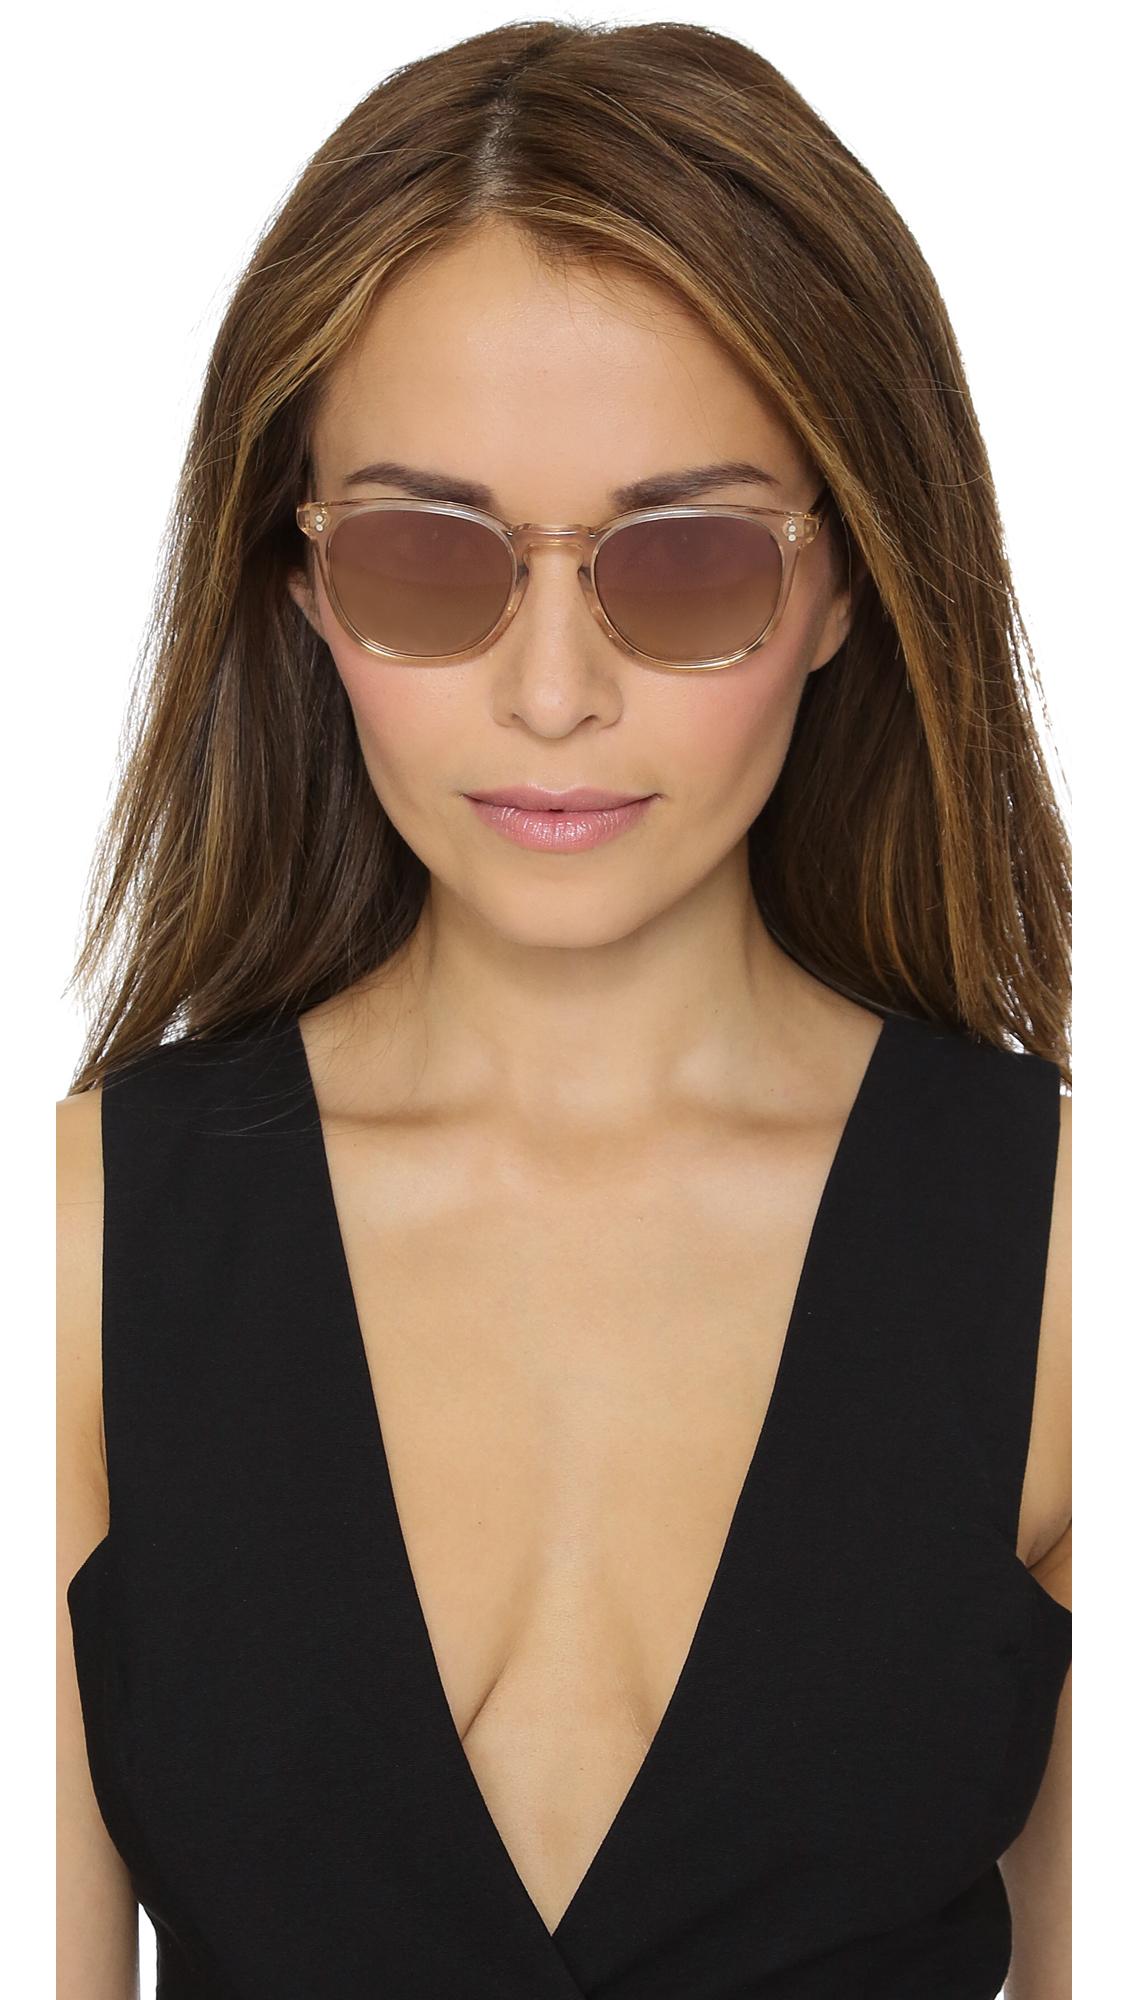 Oliver Peoples Finley Esq. Sunglasses - Blush/rose Quartz Mirror in Pink